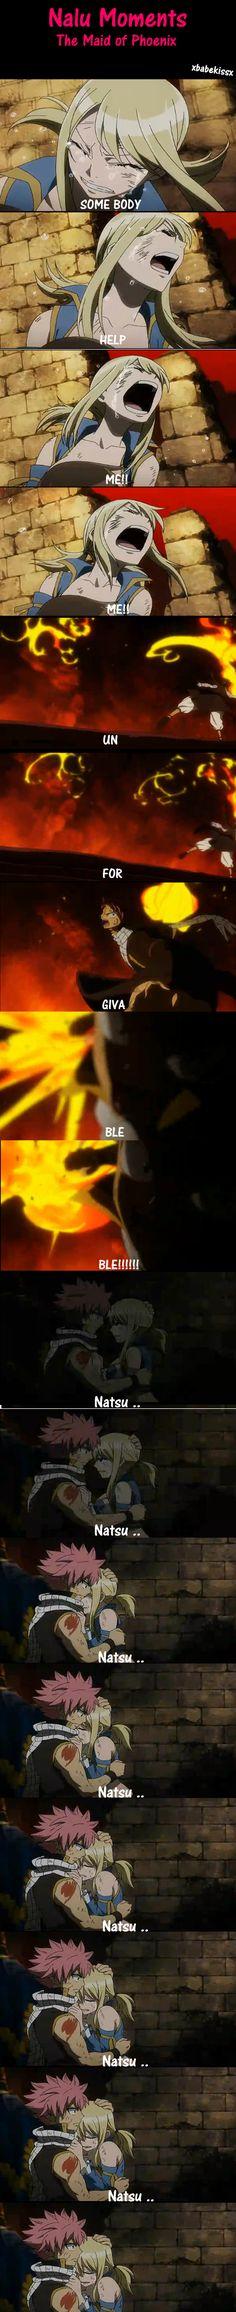 Nalu Moments - The Maid of Phoenix by celestialxbeauty